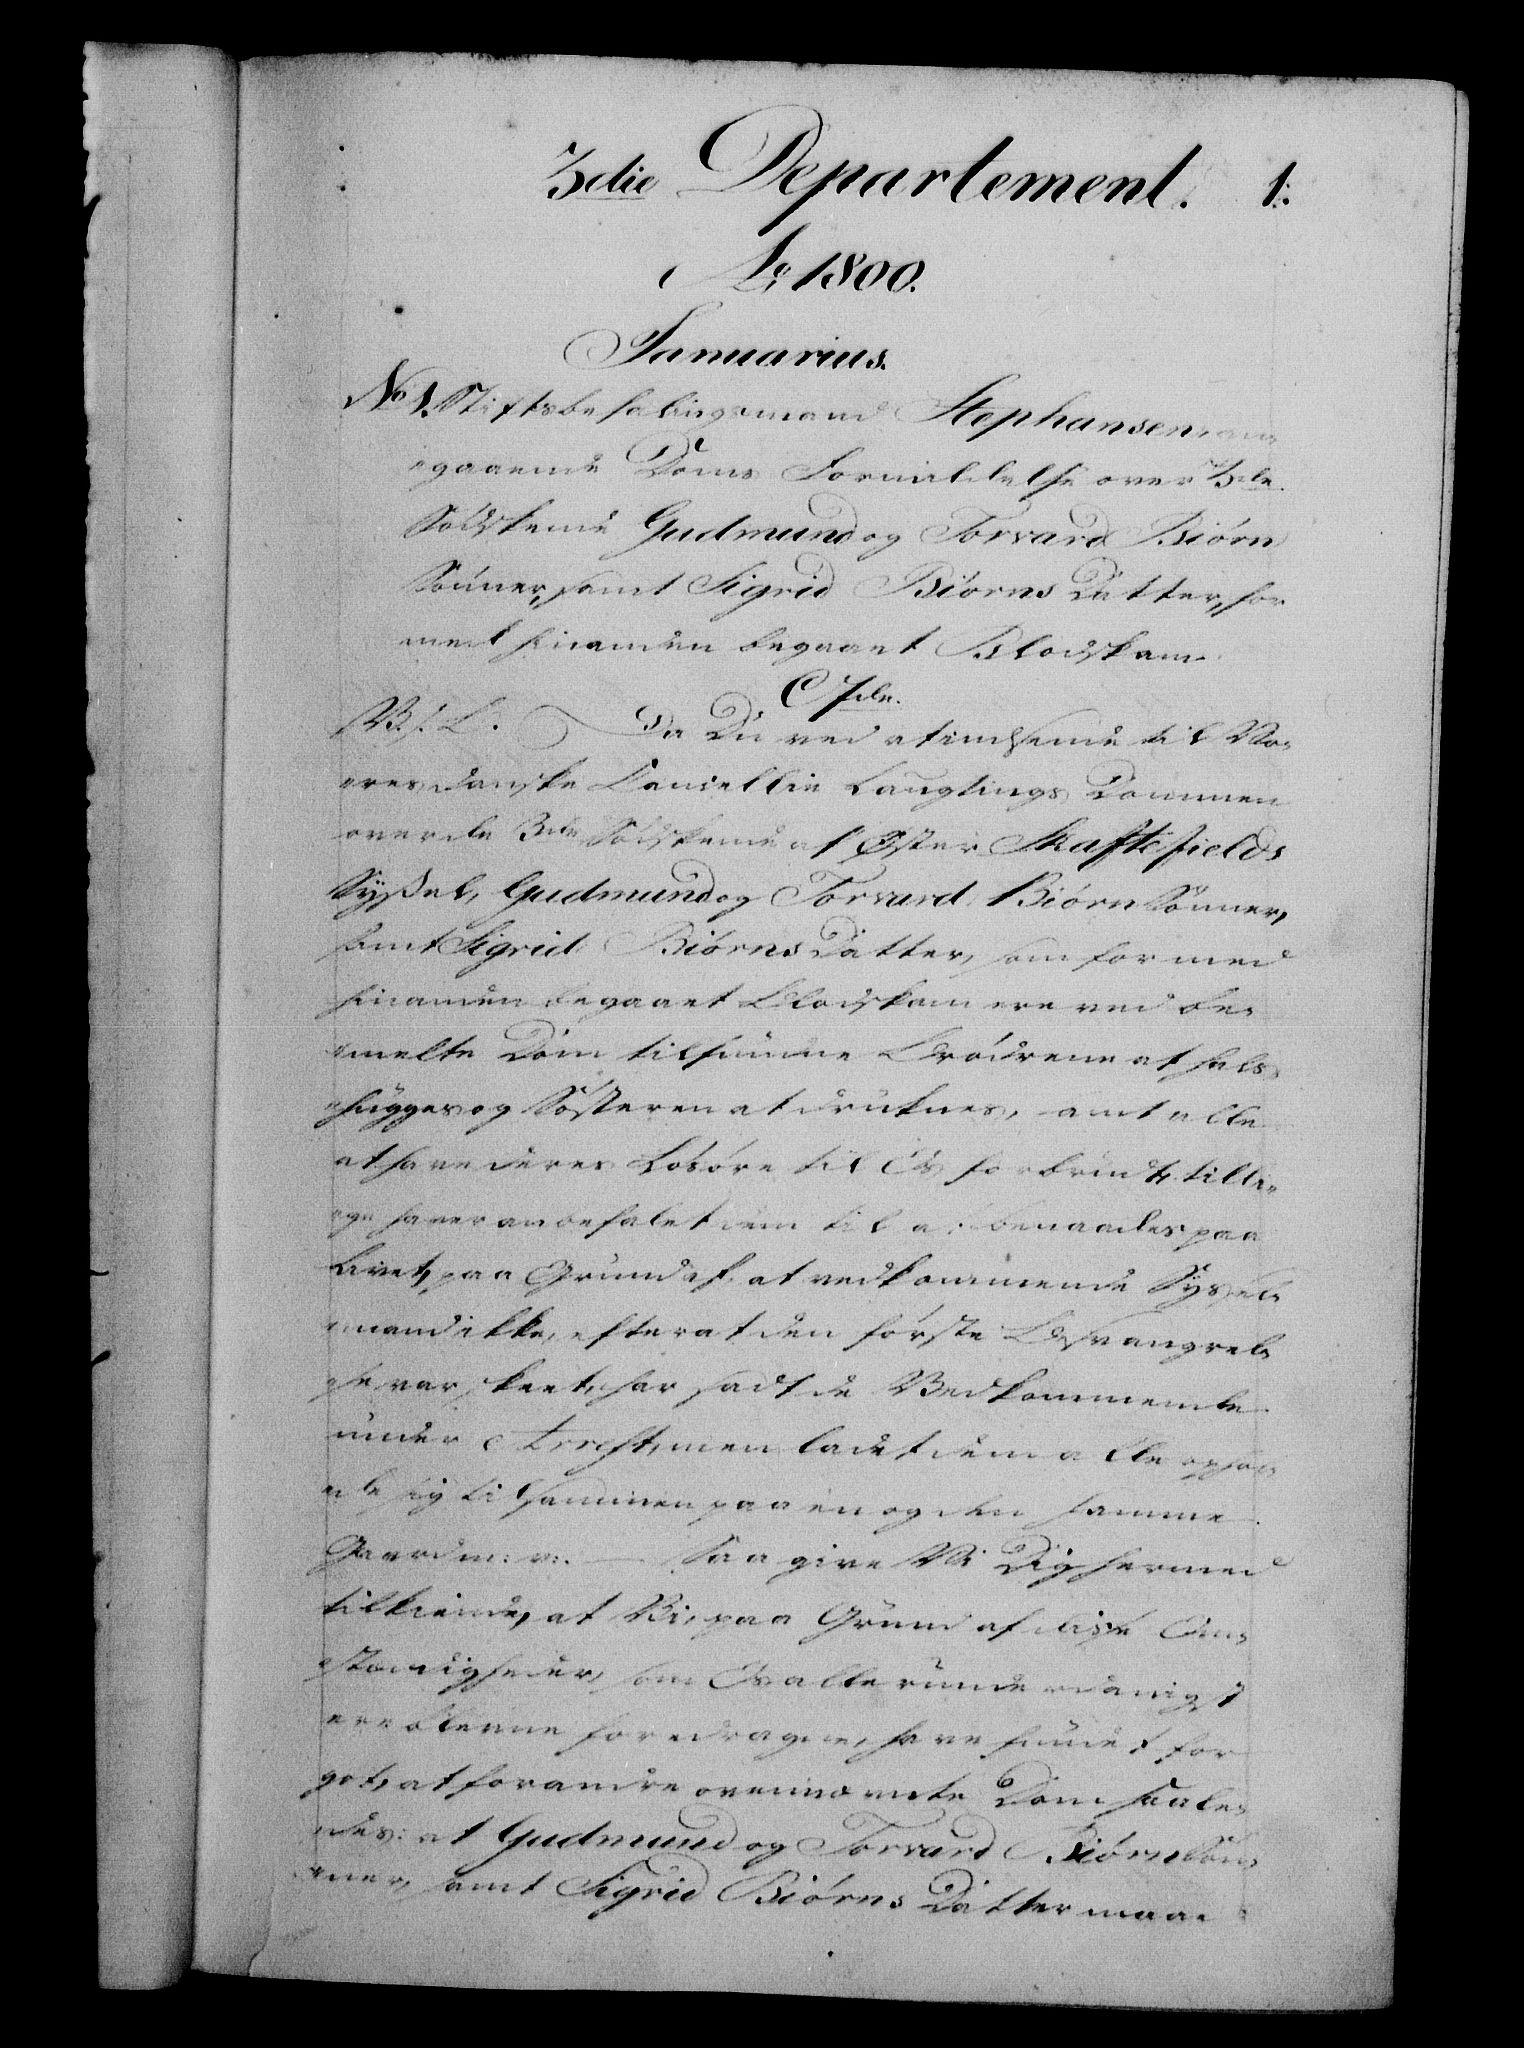 RA, Danske Kanselli 1800-1814, H/Hf/Hfb/Hfba/L0001: Registranter, 1800-1801, s. 1a